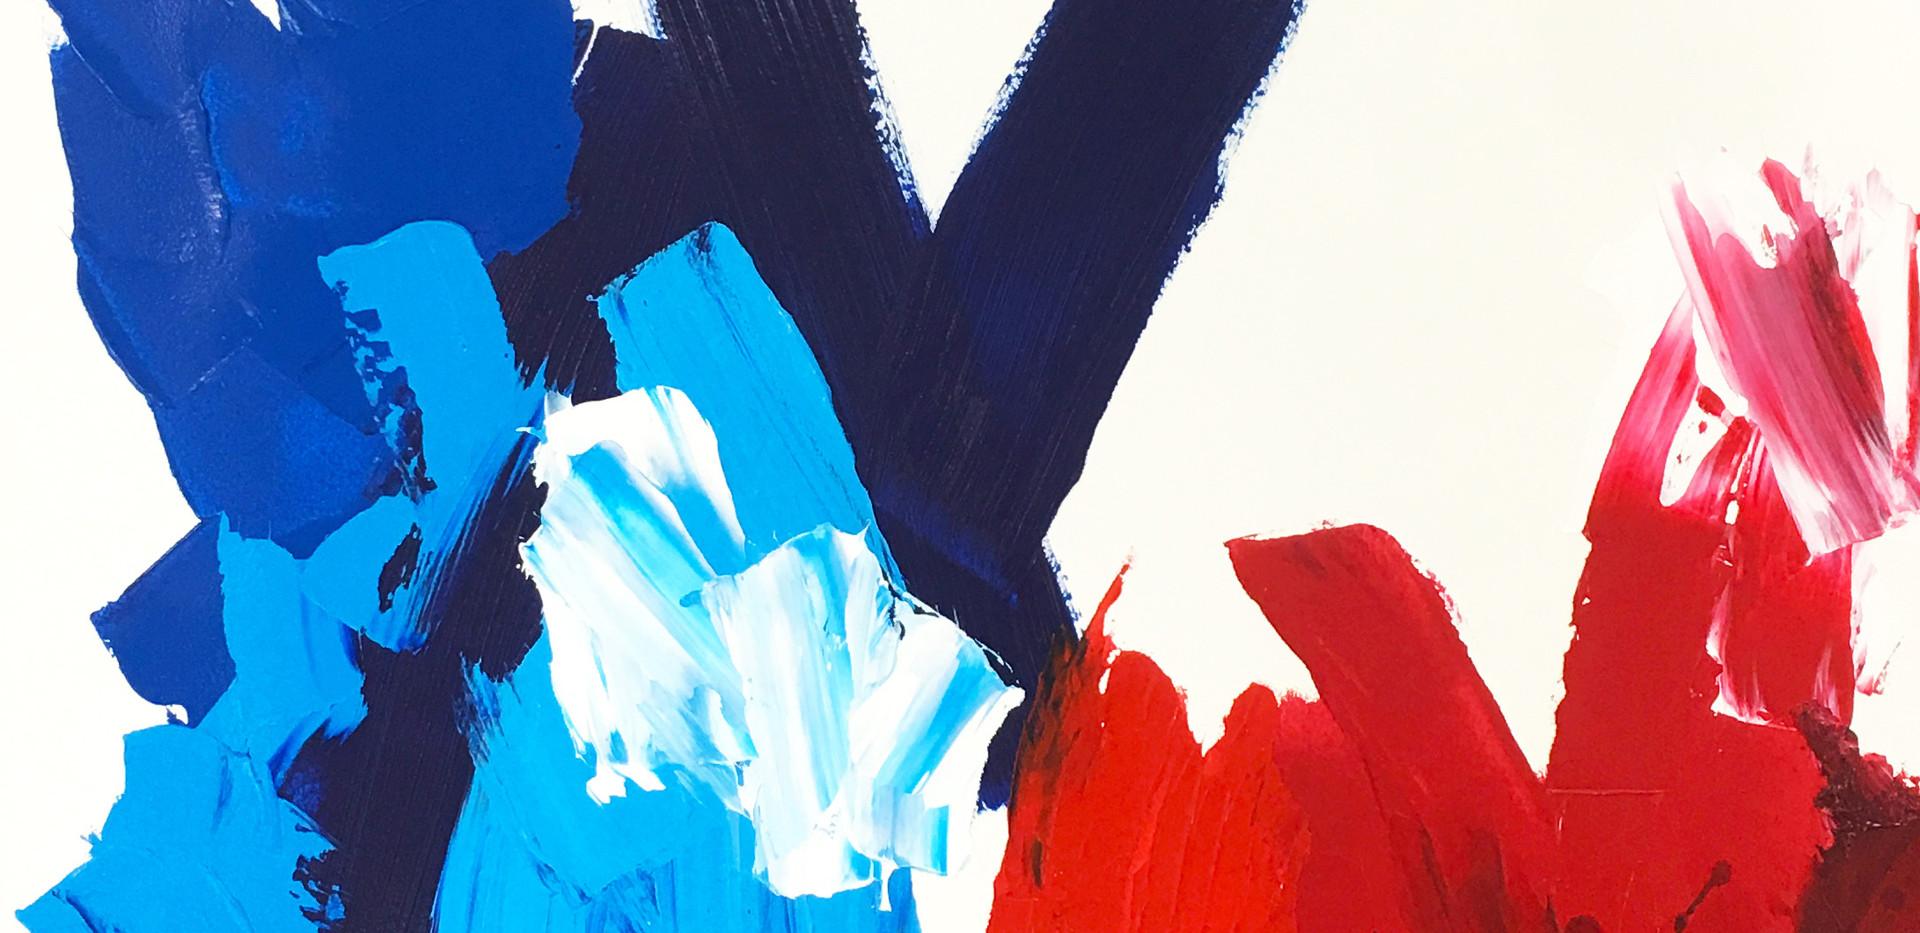 Karina Matheus - The Art is Alive! I